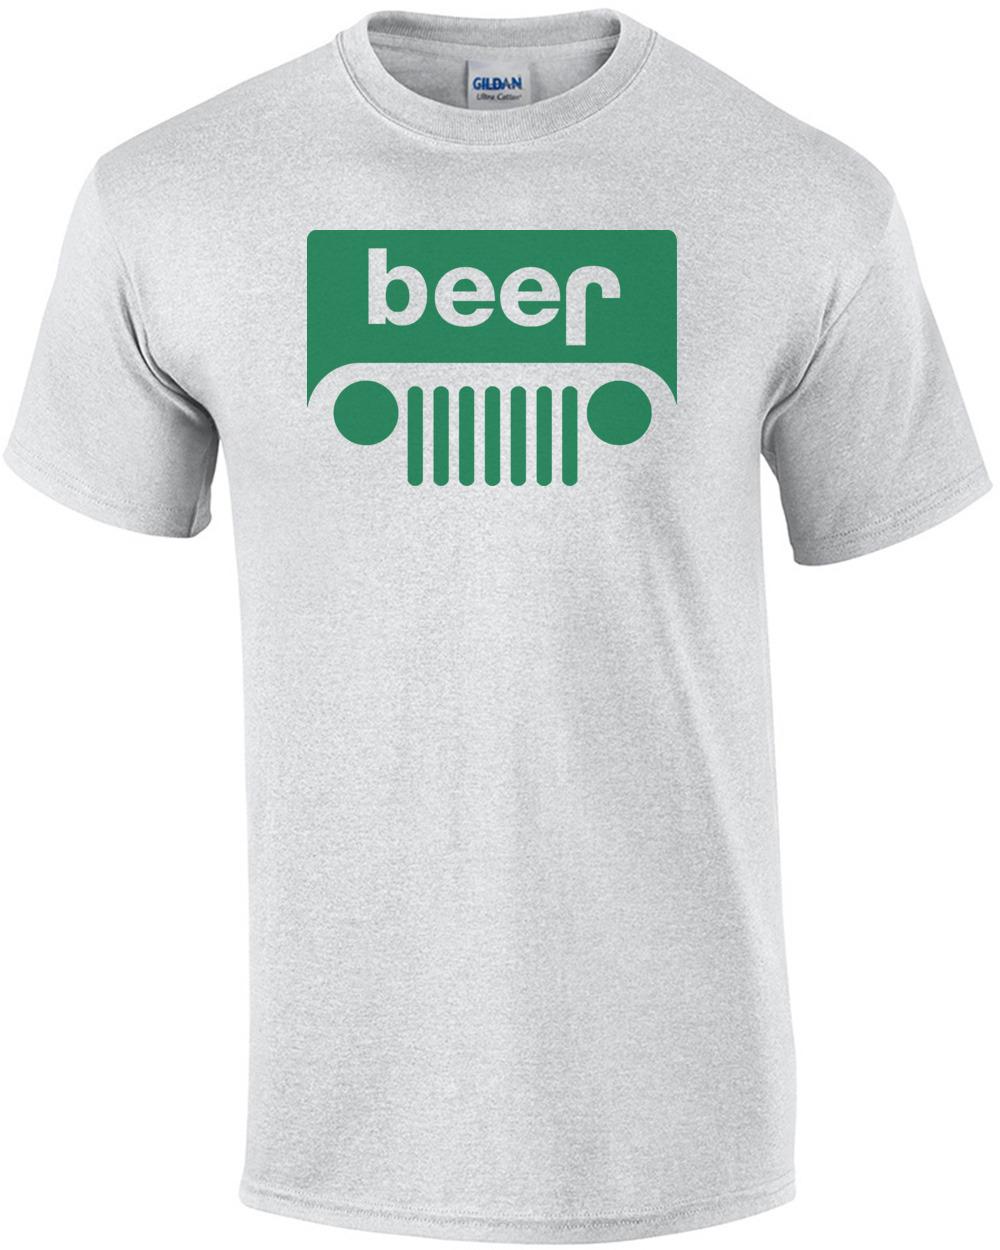 2a6c70b72 Beer Jeep Logo Parody Funny T-shirt